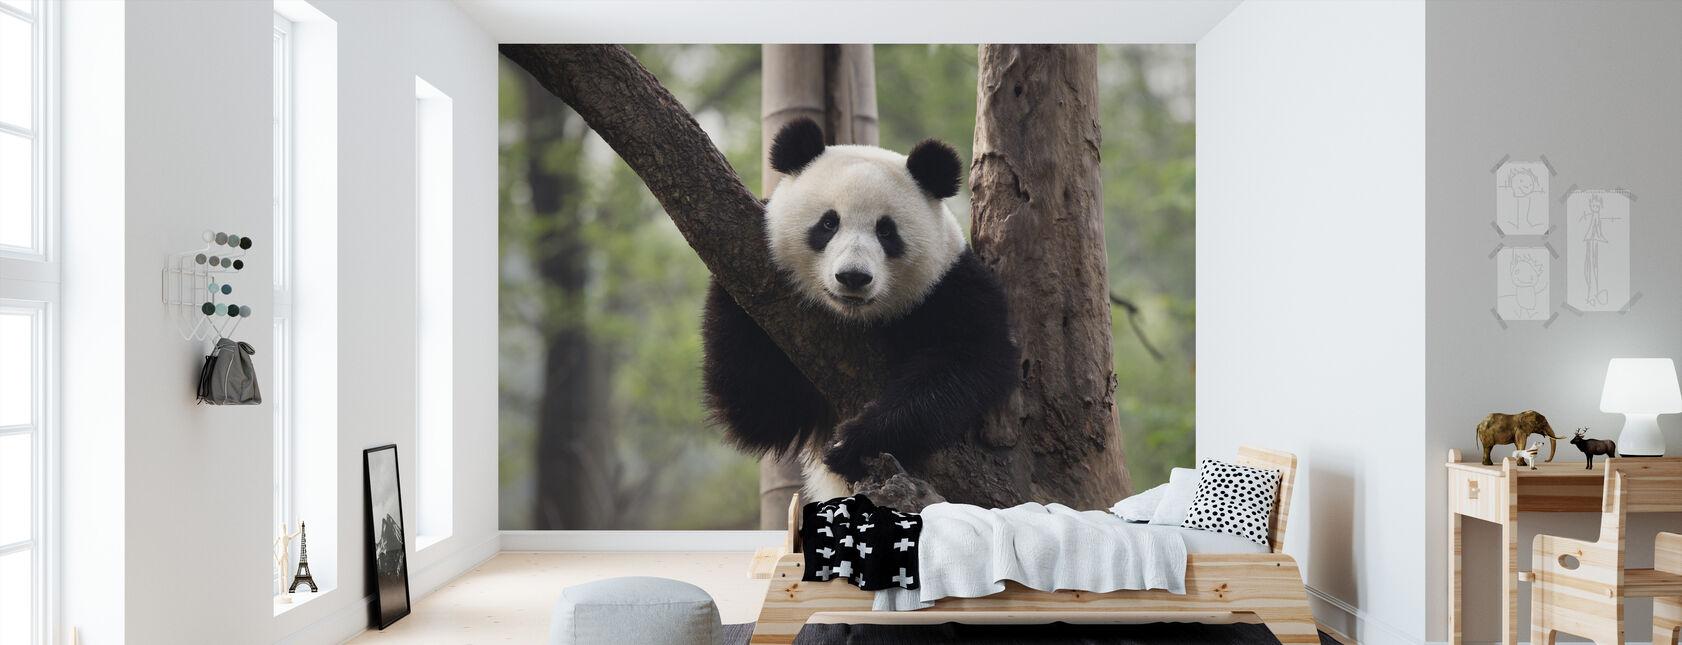 Sweet Panda - Wallpaper - Kids Room